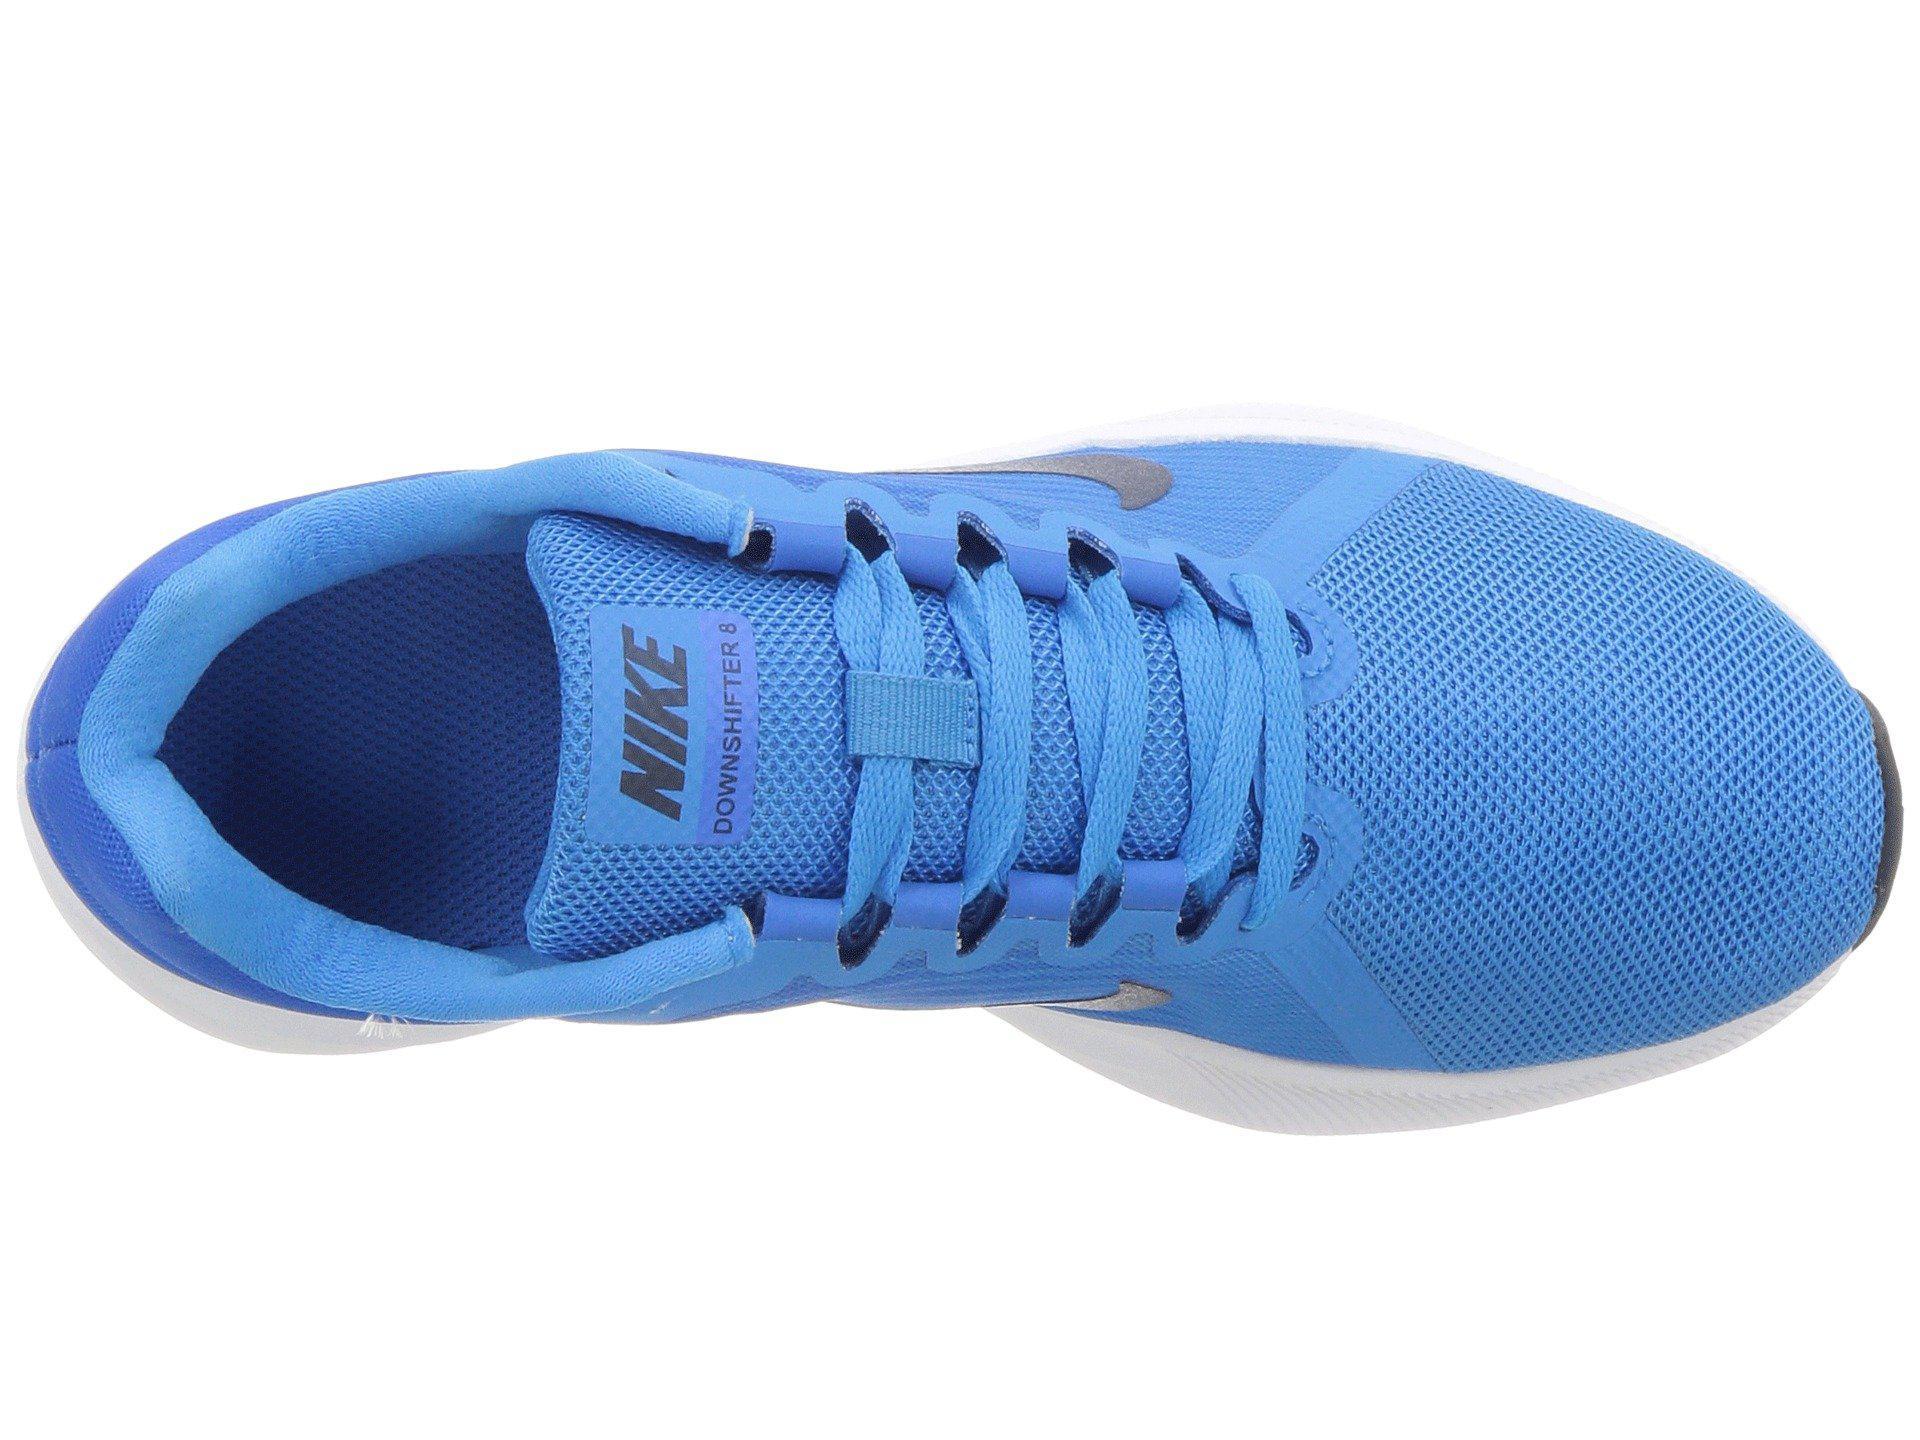 nike downshifter 8 womens blue